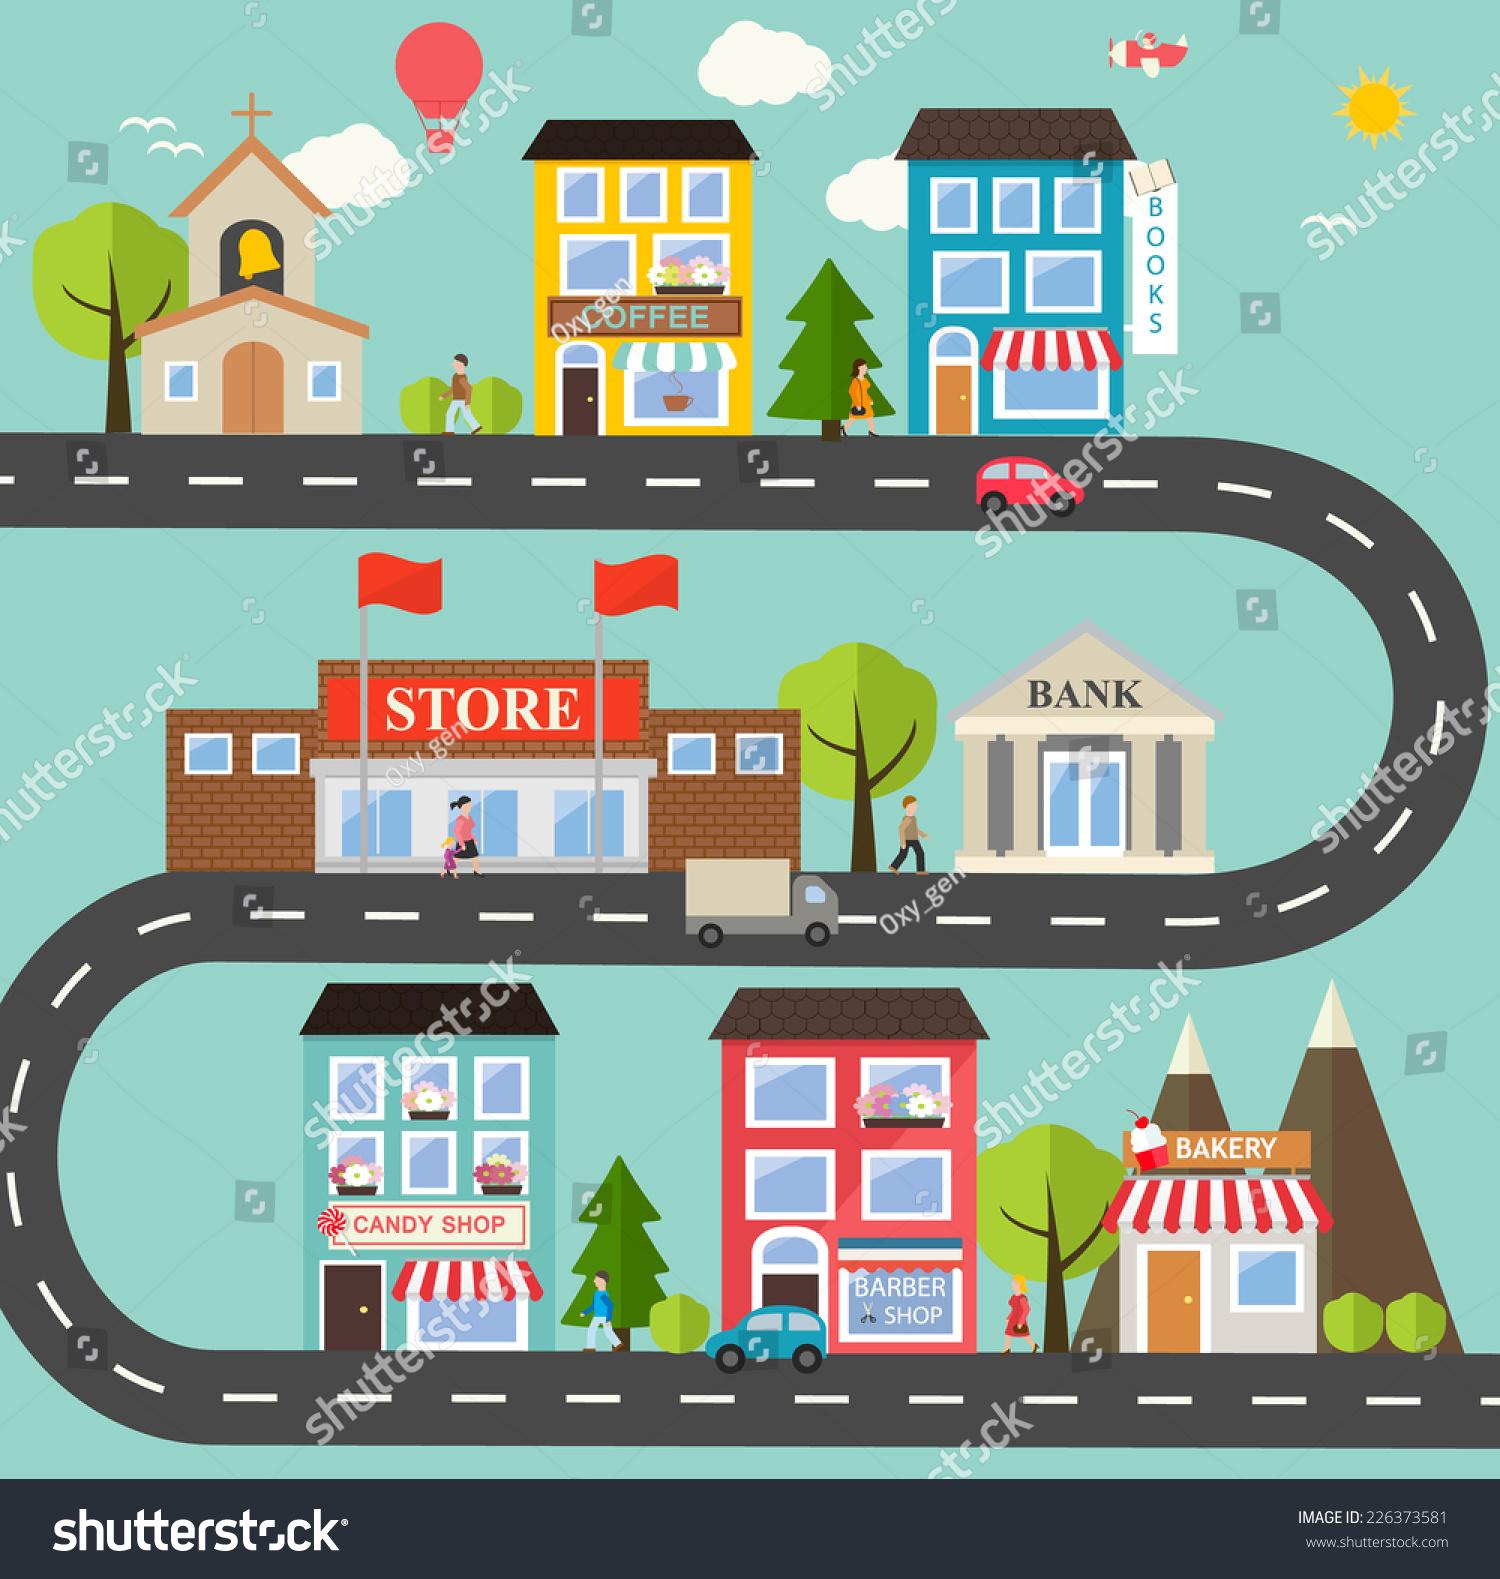 Town Landscape Vector Illustration: Small Town Urban Landscape Flat Design Stock Vector